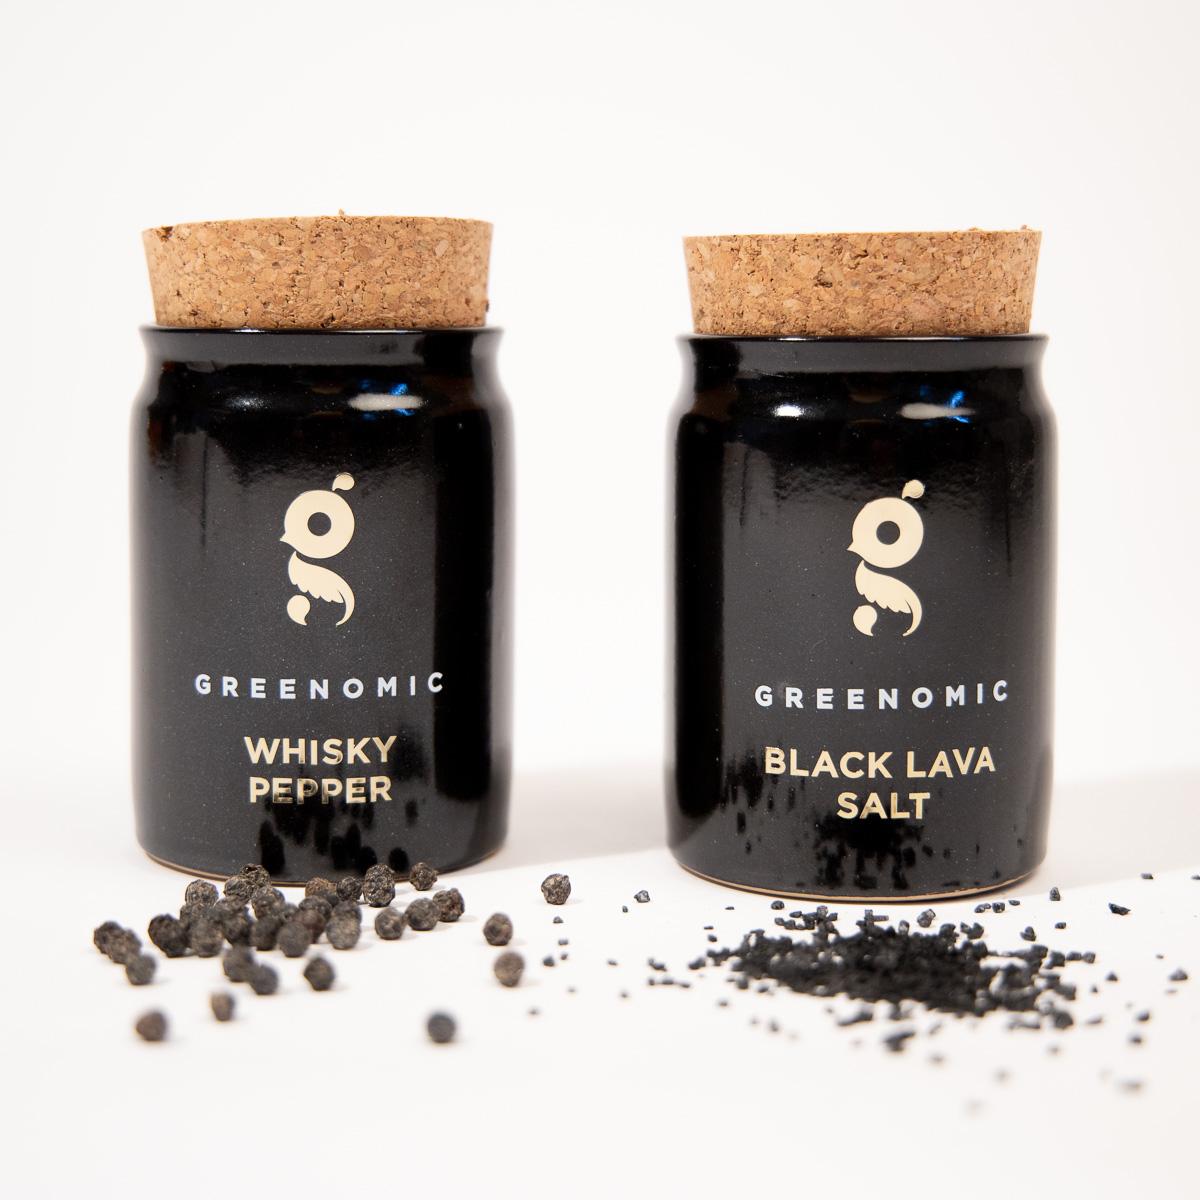 Black Lava Salz oder Whisky Pfeffer